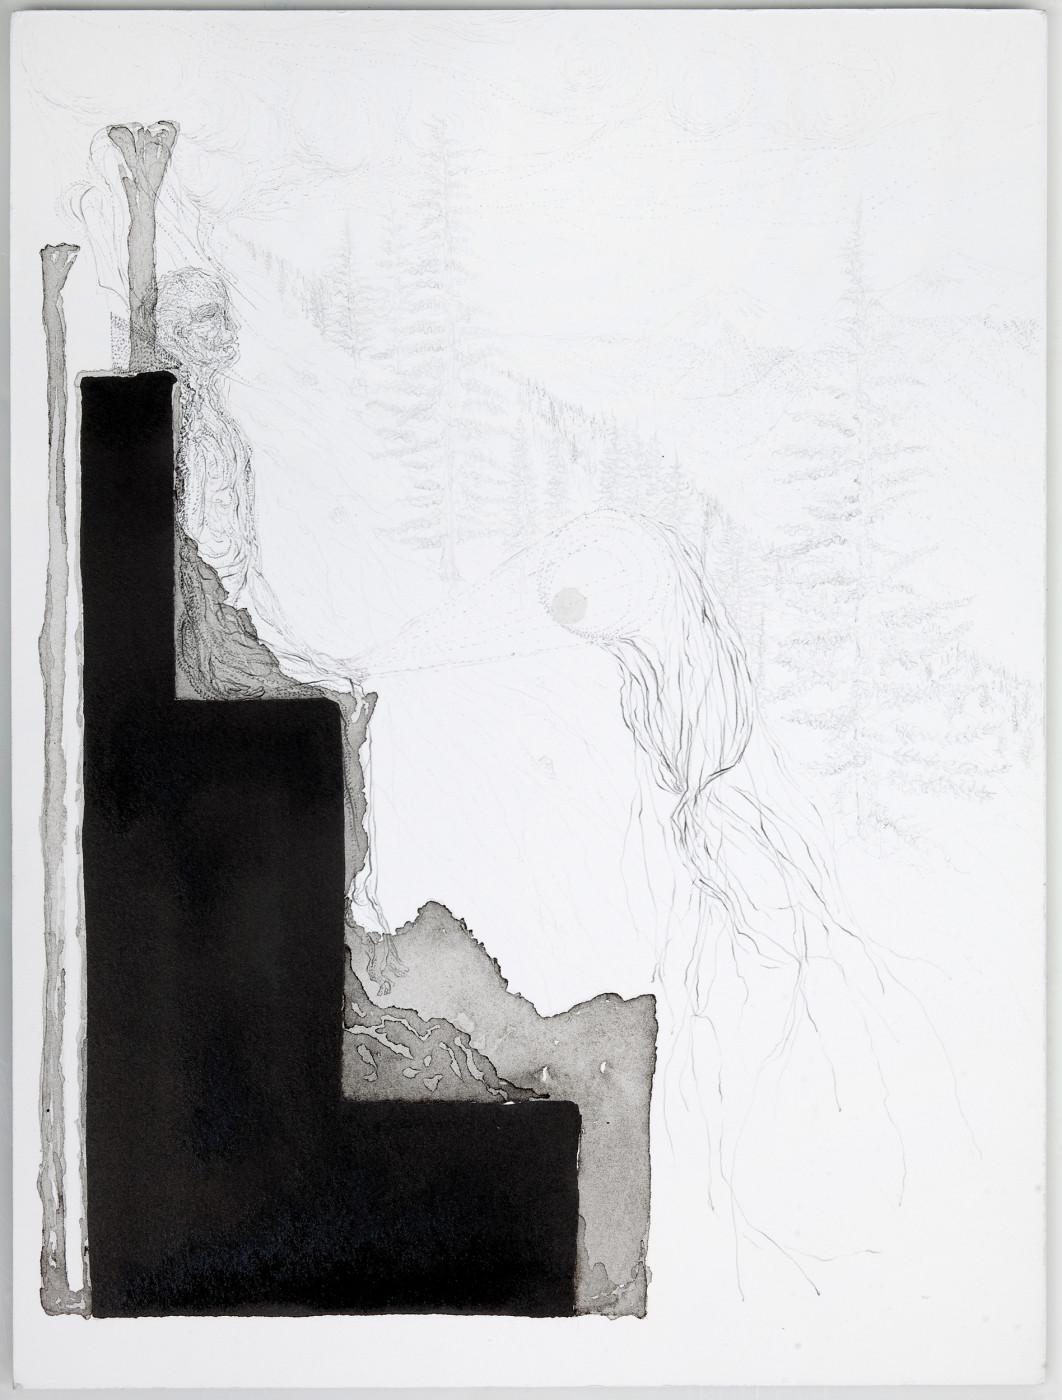 "<div class=""artwork_caption""><p>KA: Galena Summit, 2009</p></div>"